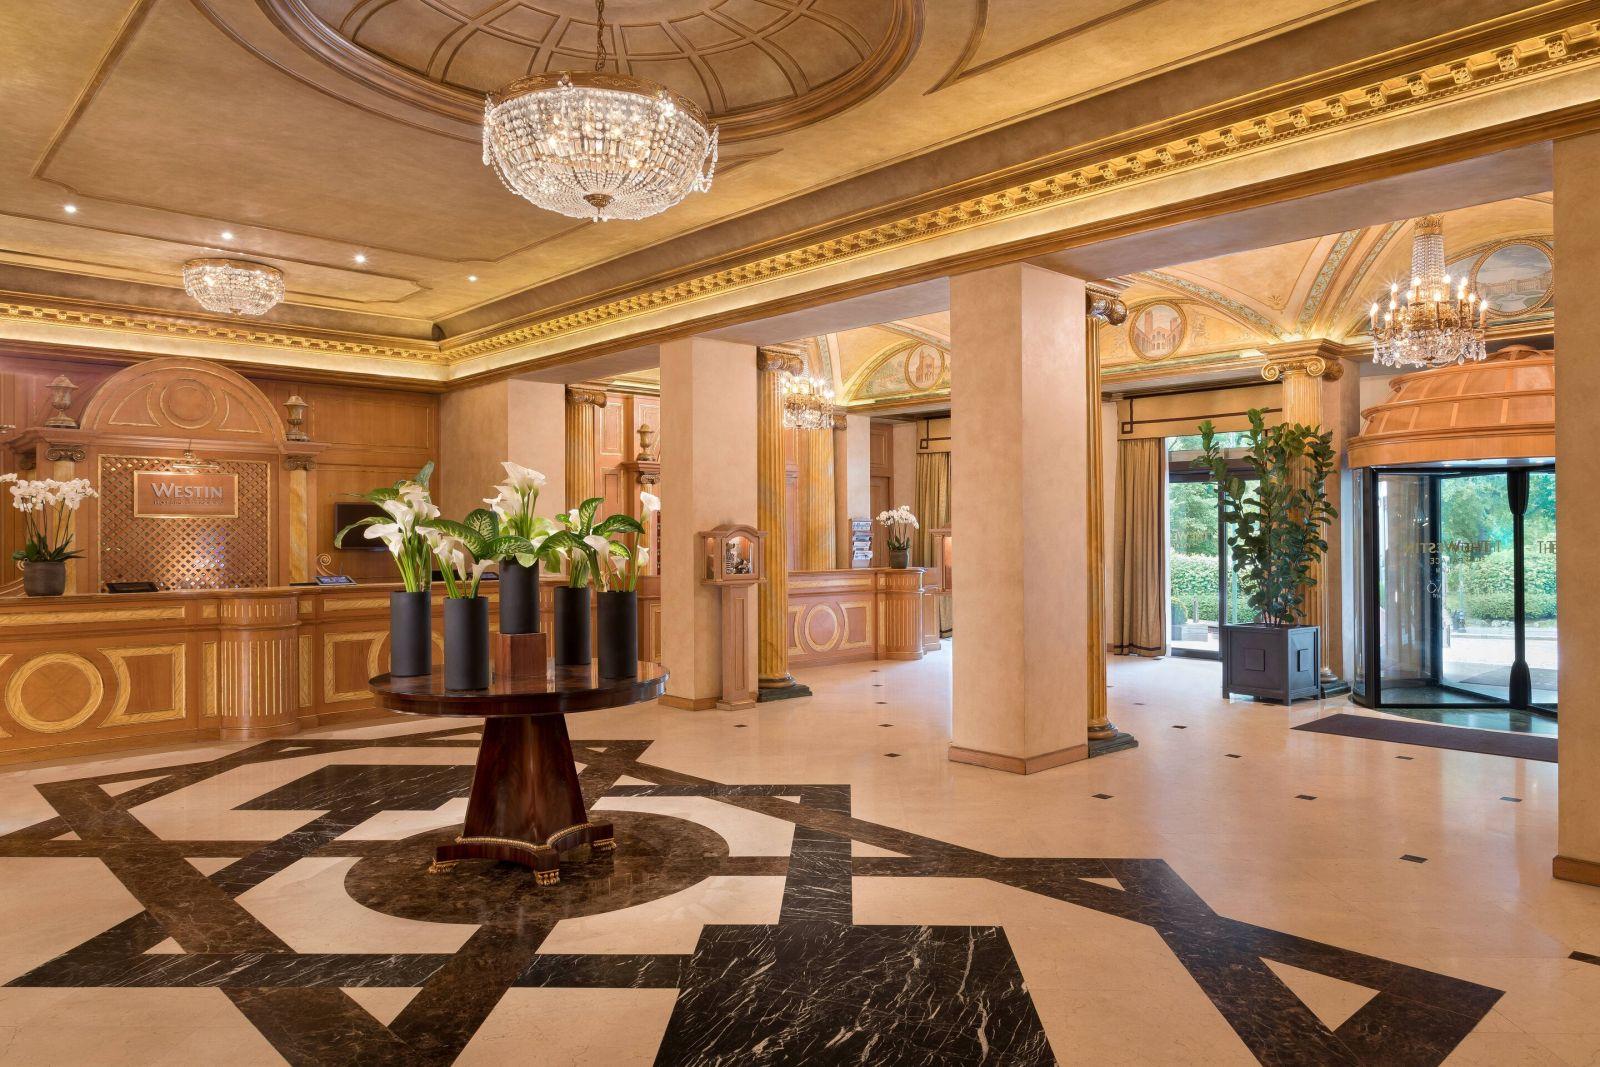 Westin Palace Hotel Milan Lobby